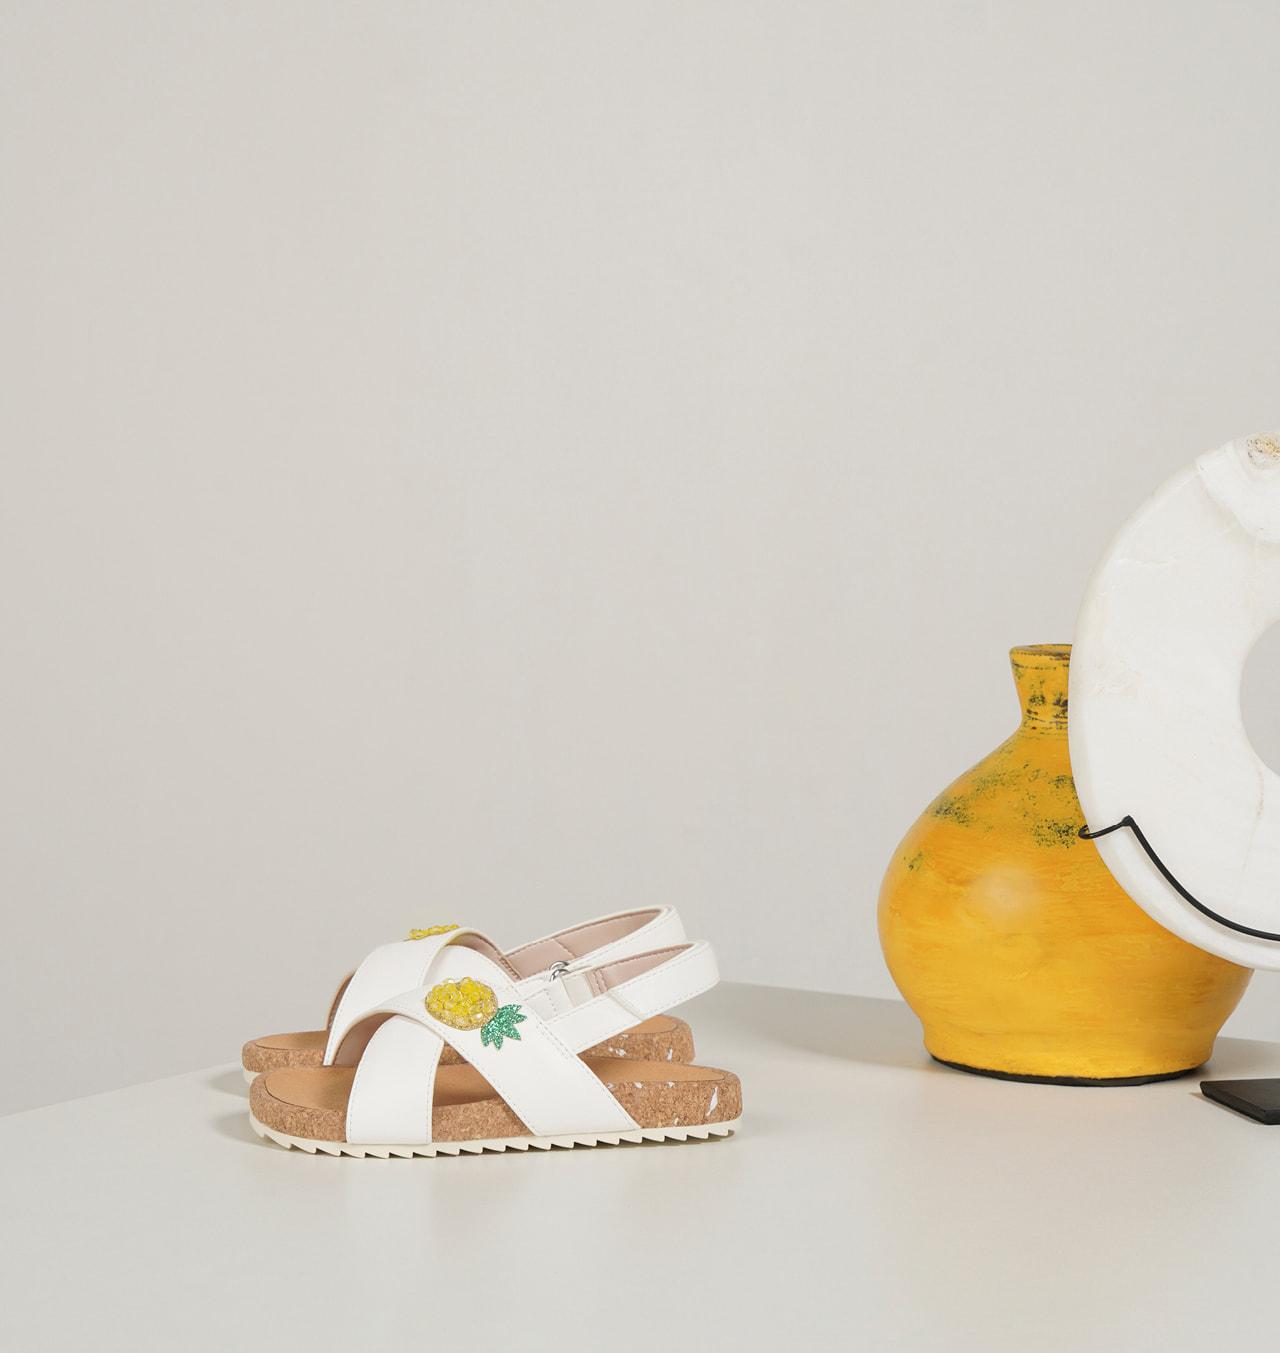 兒童小鳳梨涼鞋 – CHARLES & KEITH